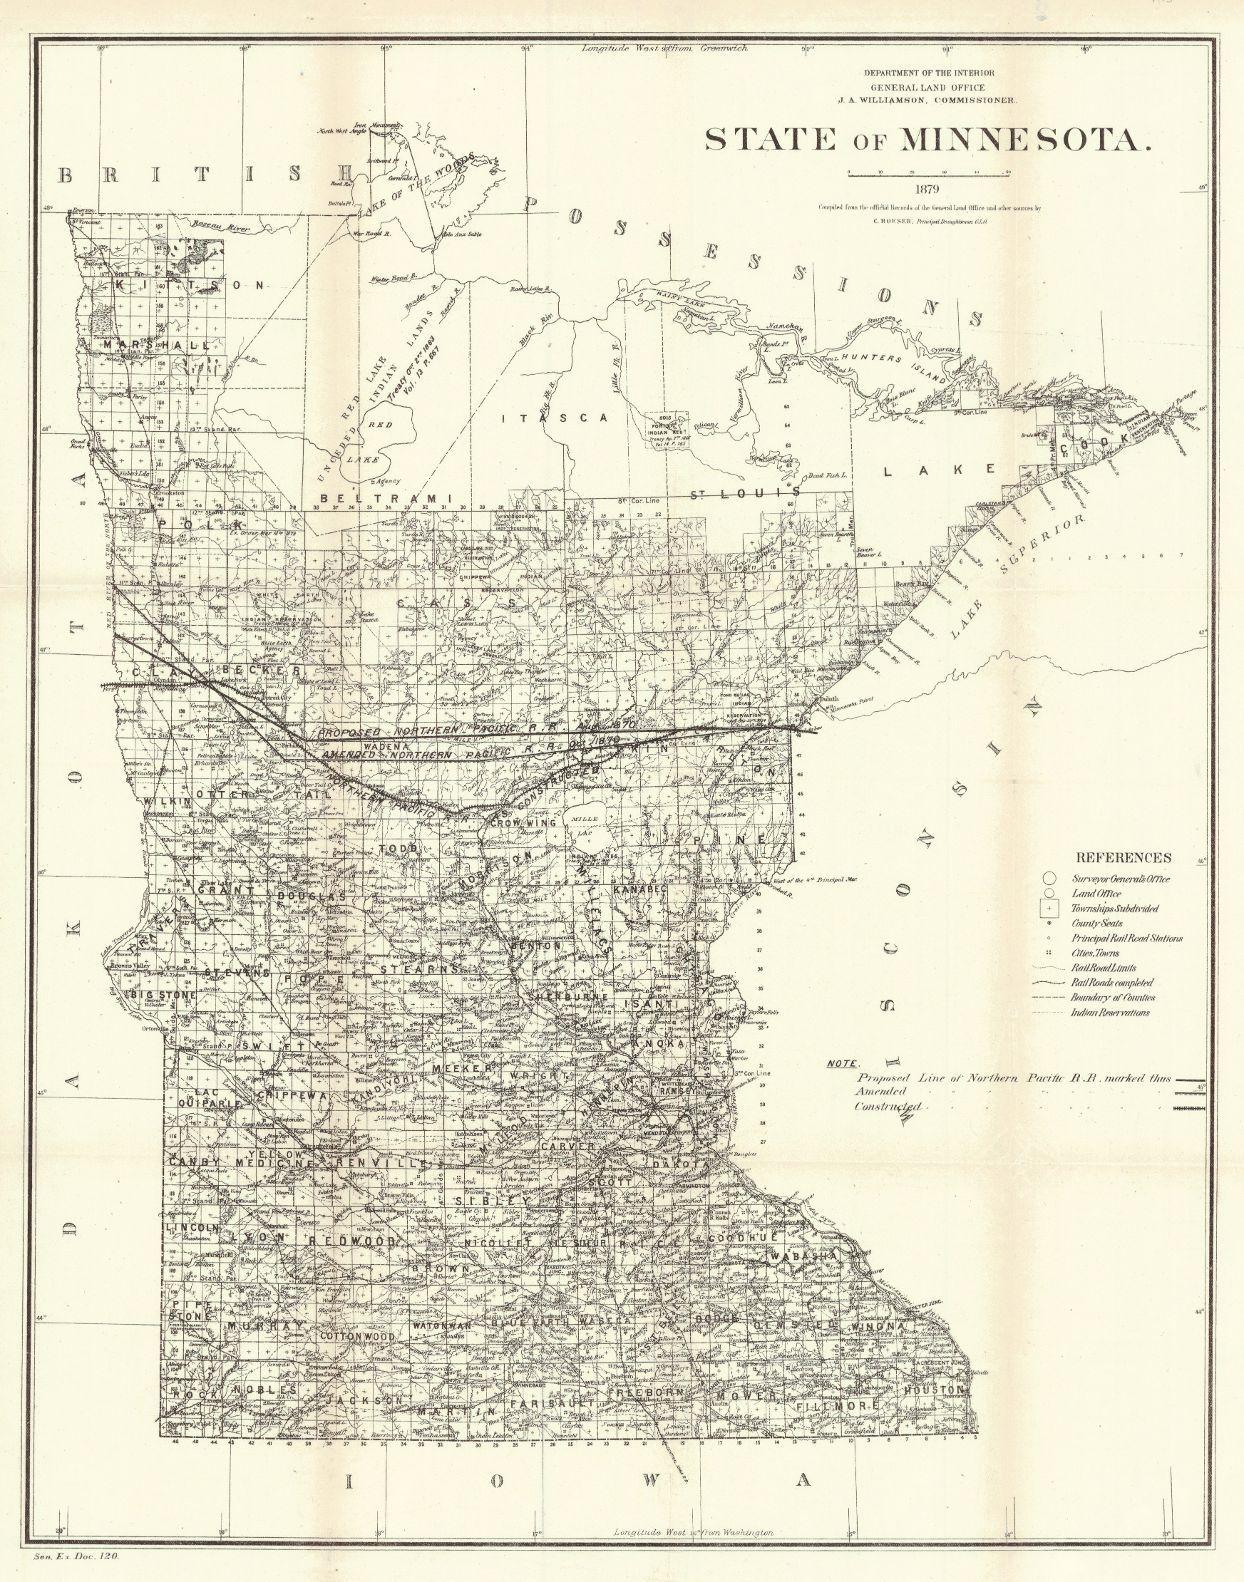 Map Antique. State of Minnesota. Julius Bien/G.L.O. 1879. New York on indian travel map, indian military map, cartoon city town map, indian alaska map, indian history map, indian reservation map new jersey, indian usa map, indian asia map, indian china map, mohawk indian territory oklahoma map, indian united states map, indian ohio map, indian texas map, indian florida map,